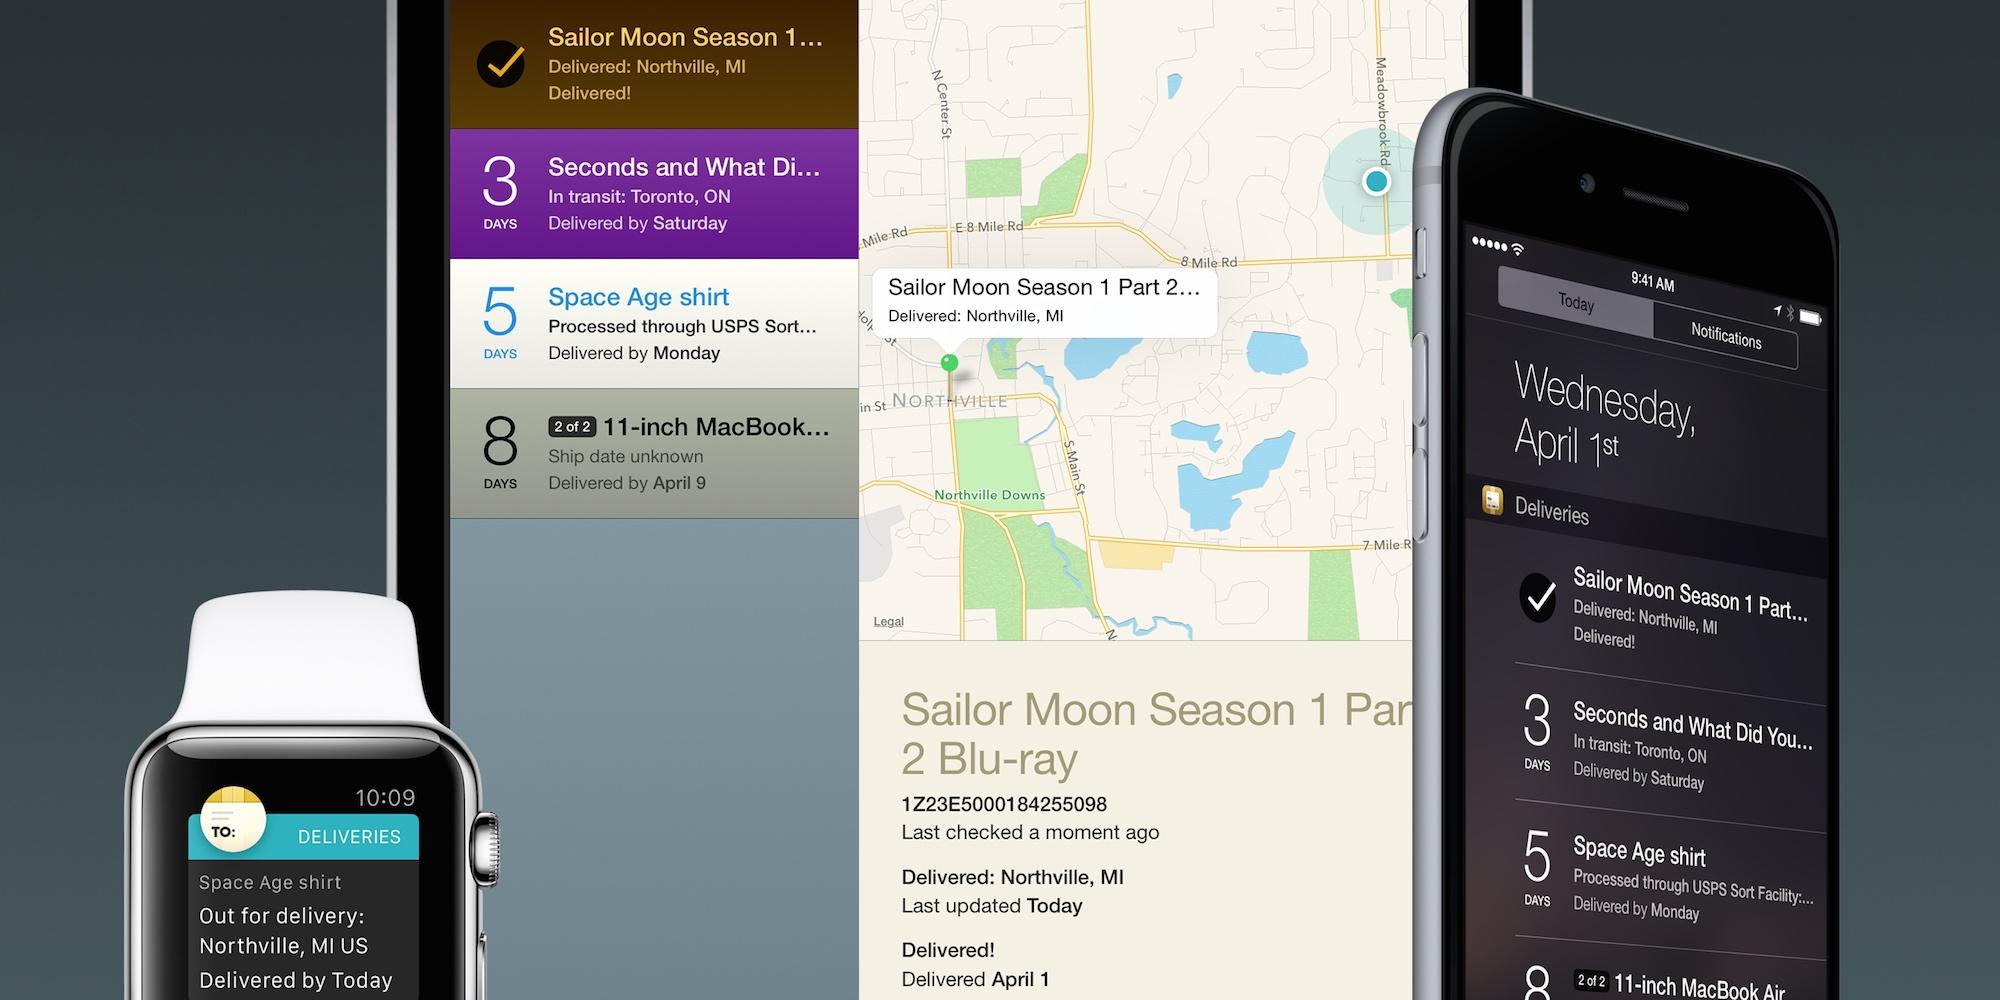 Black Friday Ios Mac App Deals Deliveries Tweetbot 5 Home Design 3d More 9to5toys,Bedroom Interior Design Modern